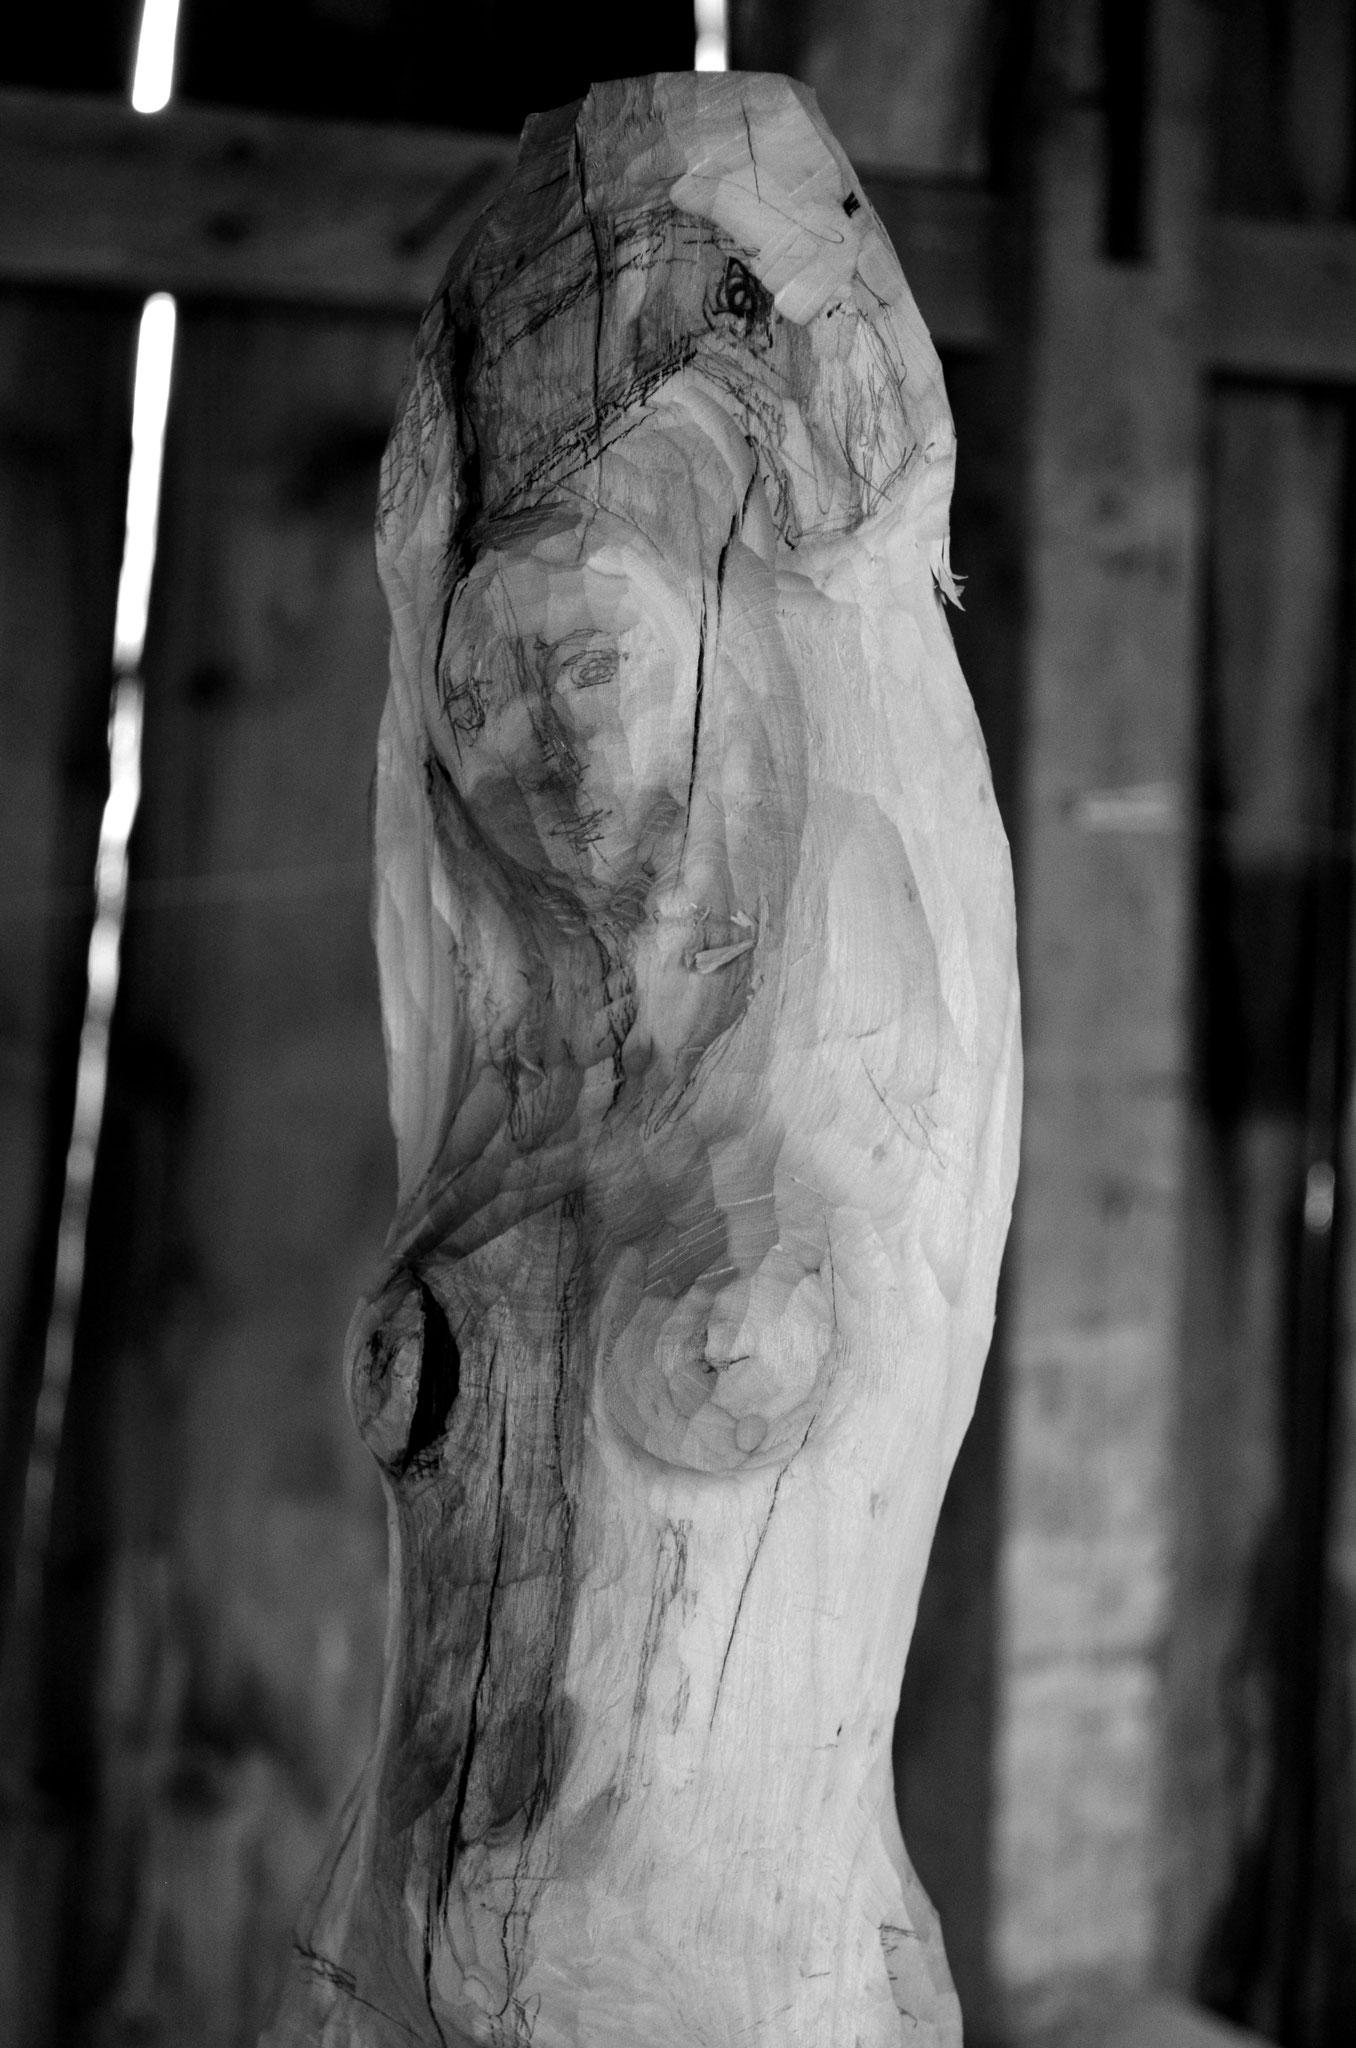 Nudo di donna, di legno di ciliegio   -   Bildhauerei Wiedemer Basadingen